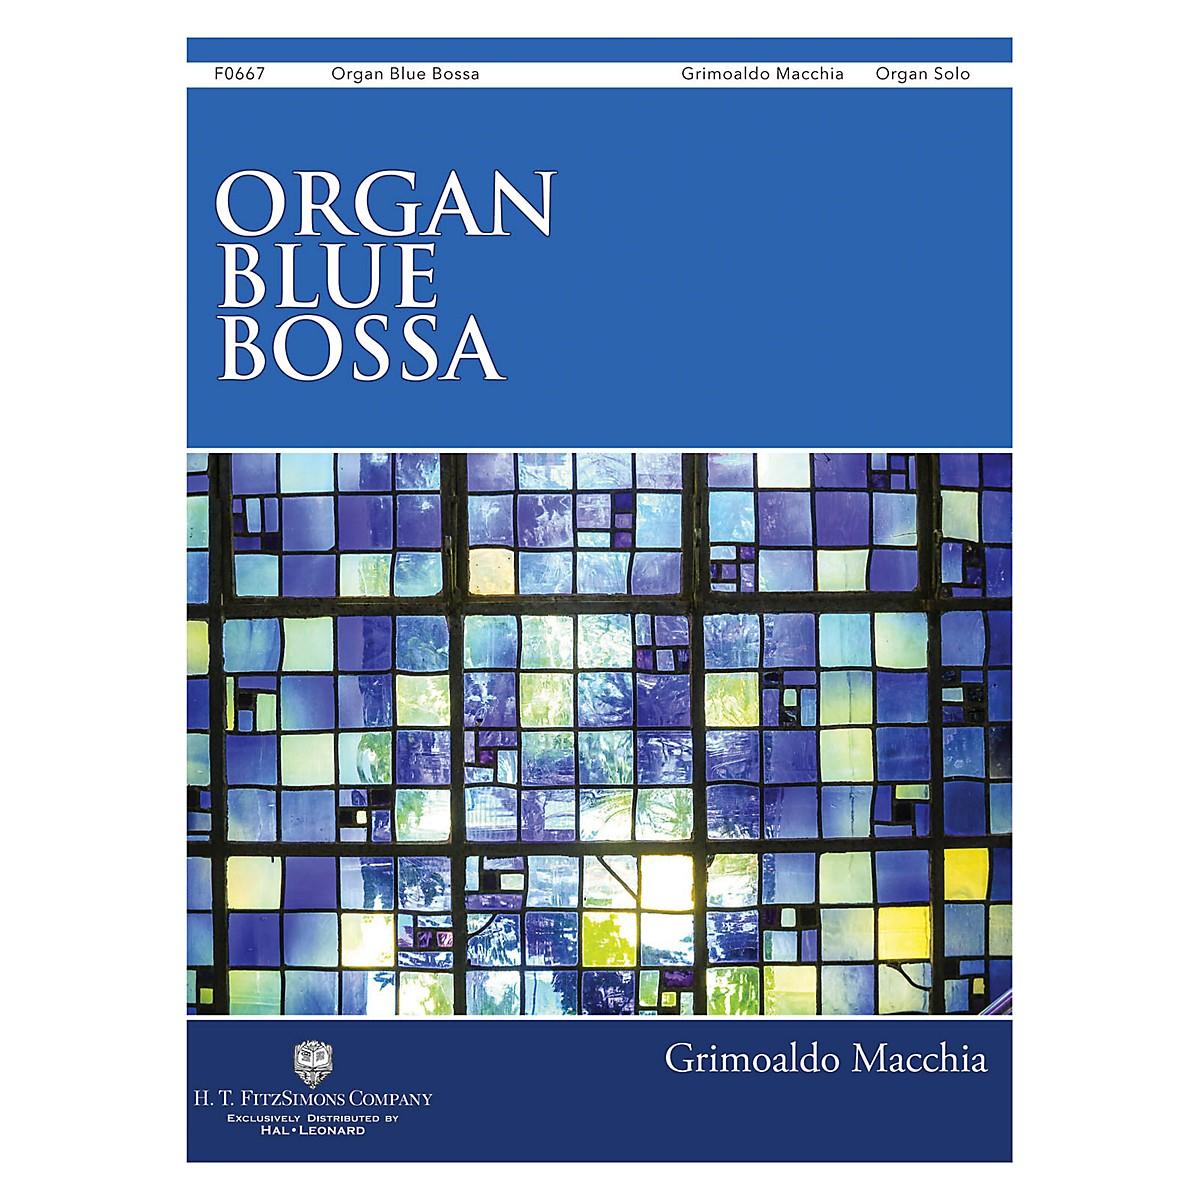 H.T. FitzSimons Company Organ Blue Bossa Organ Solo